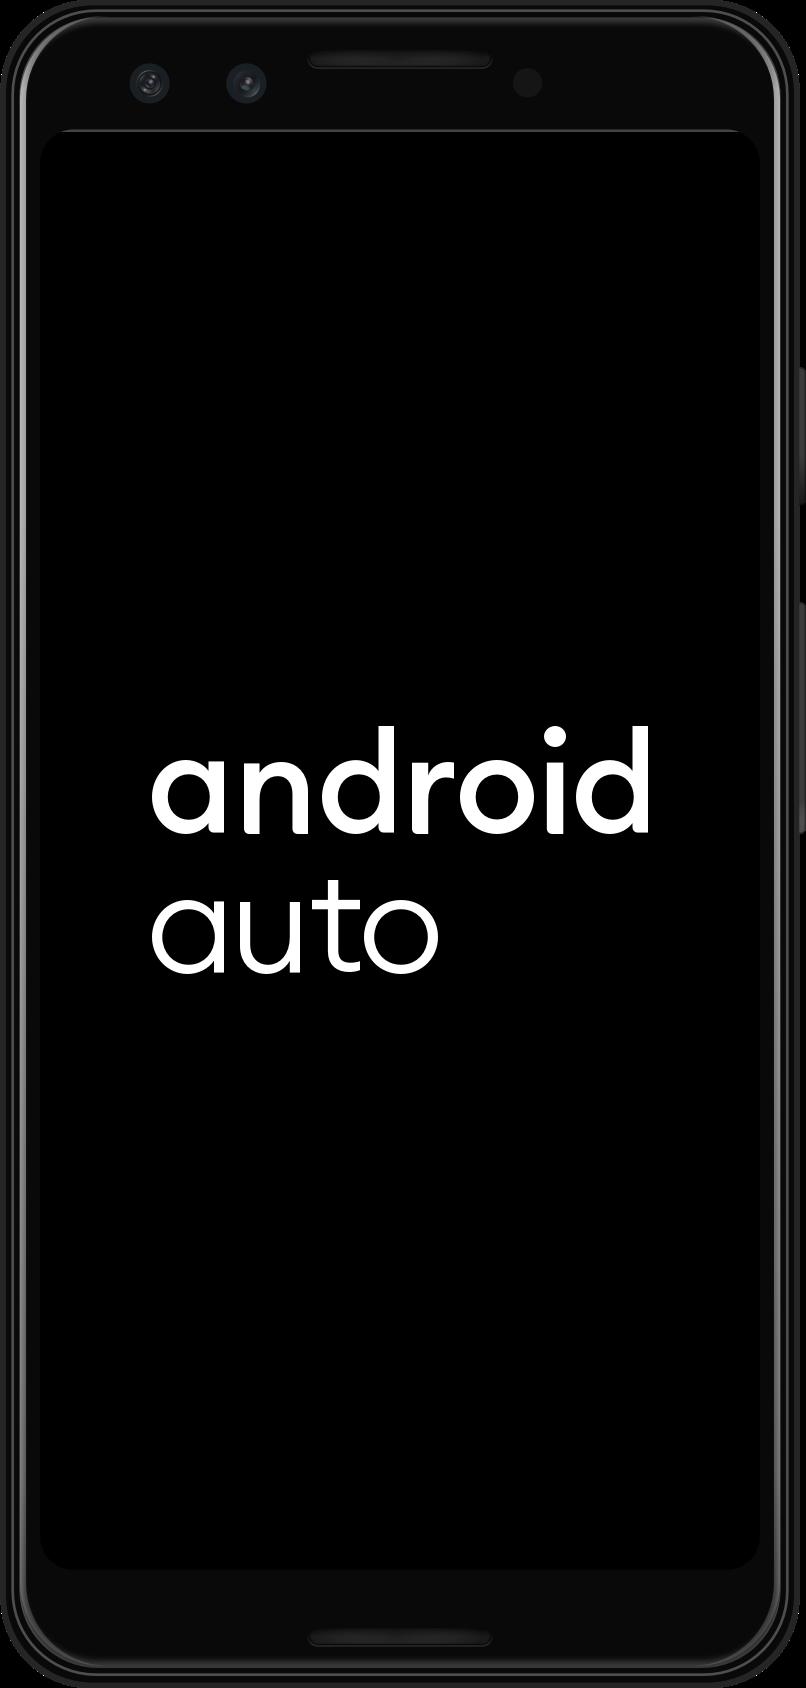 Android Auto 已在移动设备上启动